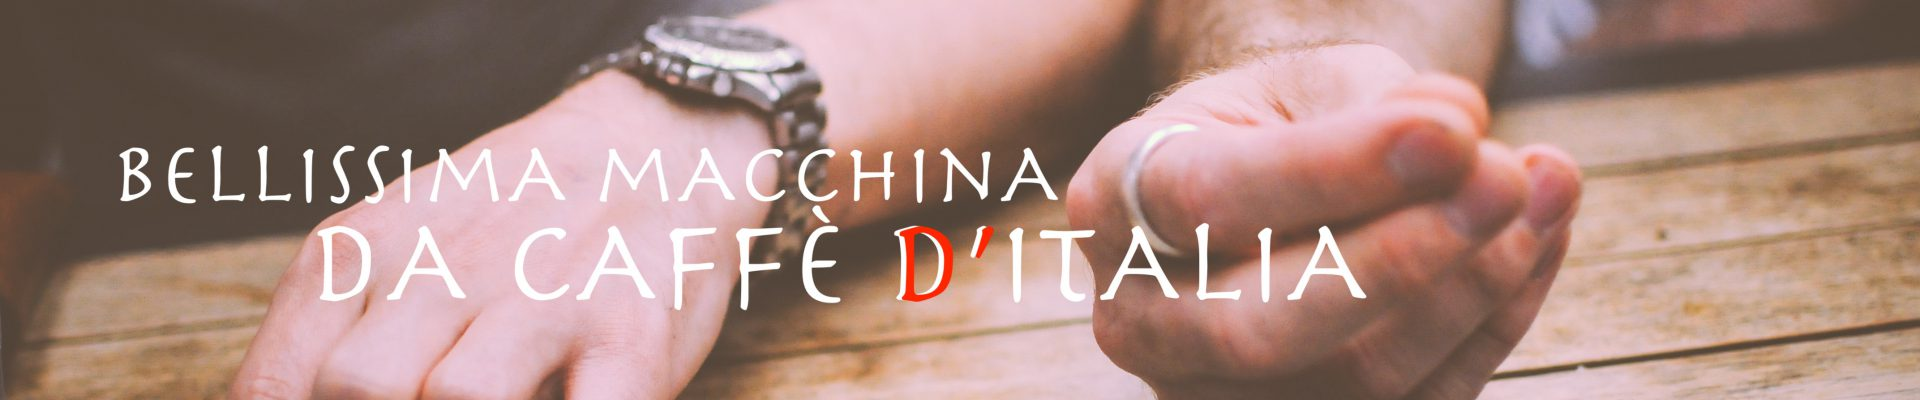 banner bellissimocaffe ditalia 3